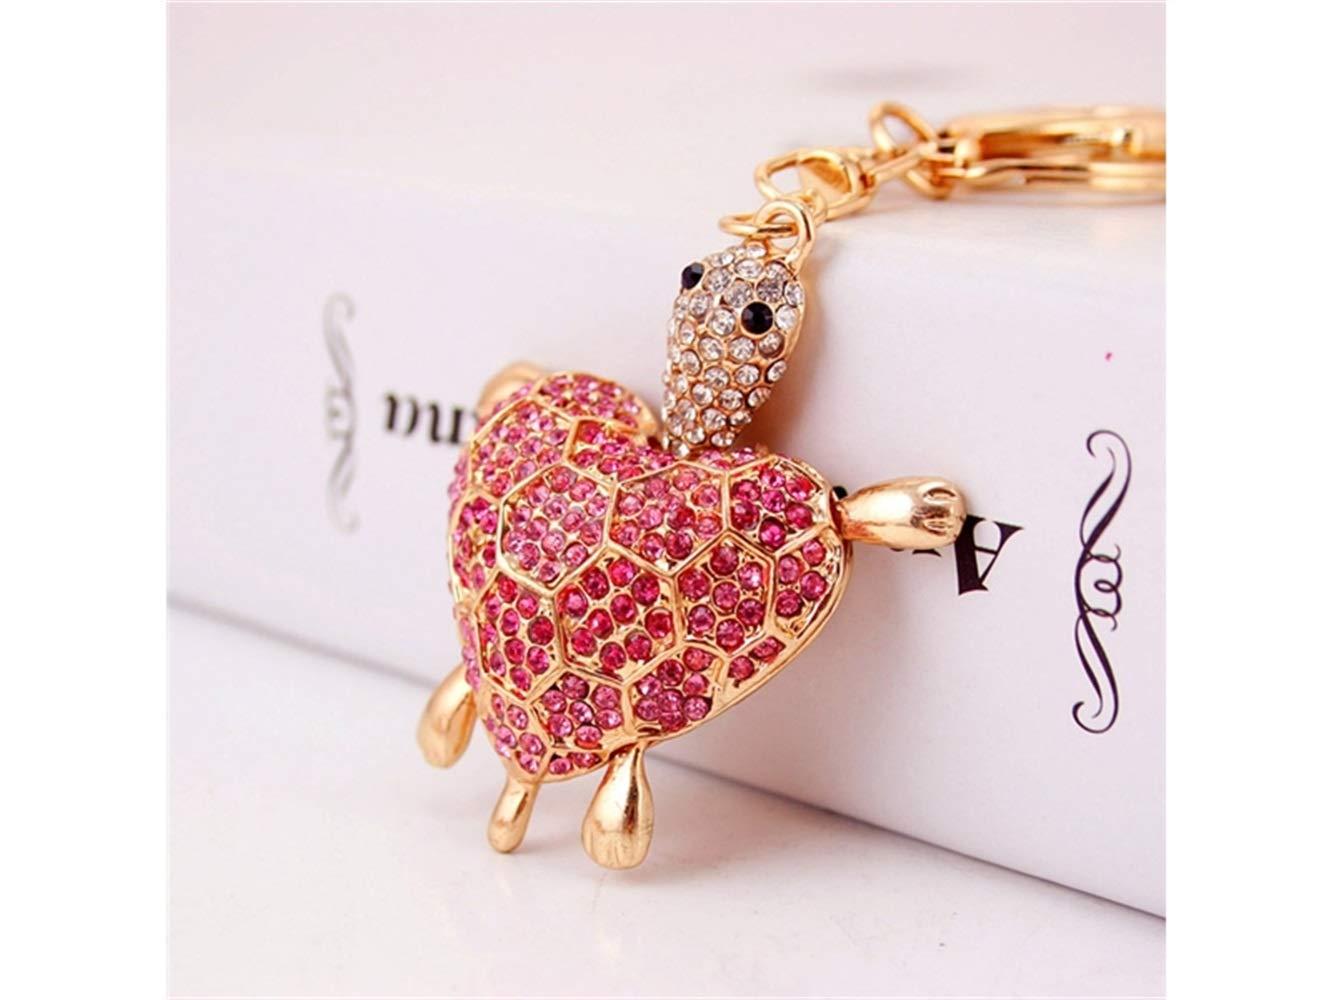 Car Keychain, Cute Diamond Love Back Shell Turtle Keychain Animal Key Trinket Car Bag Key Holder Decorations(Pink) for Gift